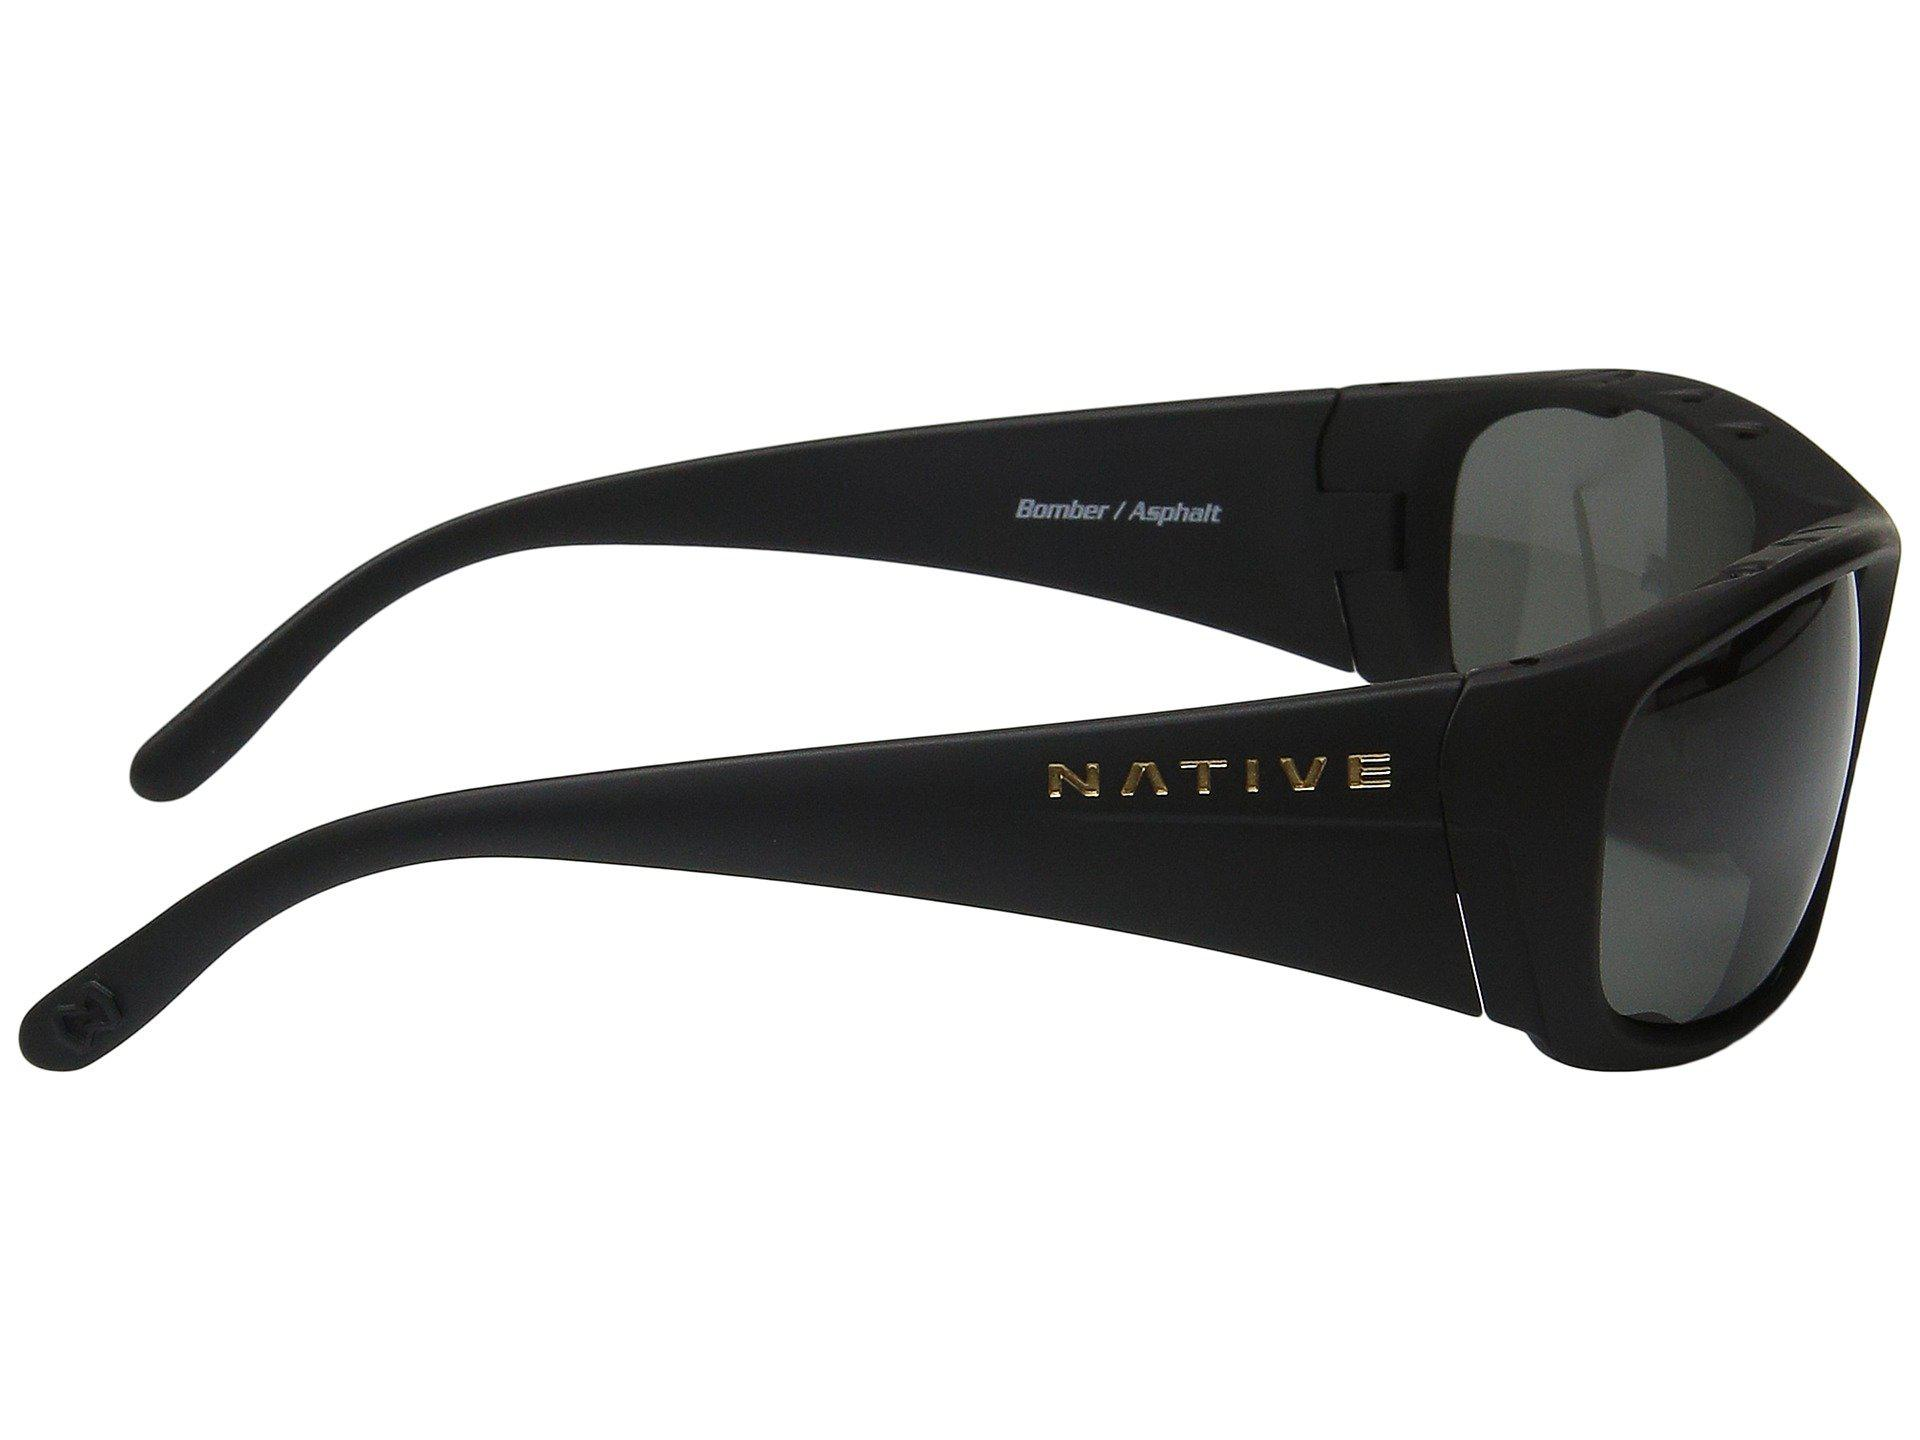 545ed67f5f Lyst - Native Eyewear Bomber (asphalt gray Lens) Sport Sunglasses in ...